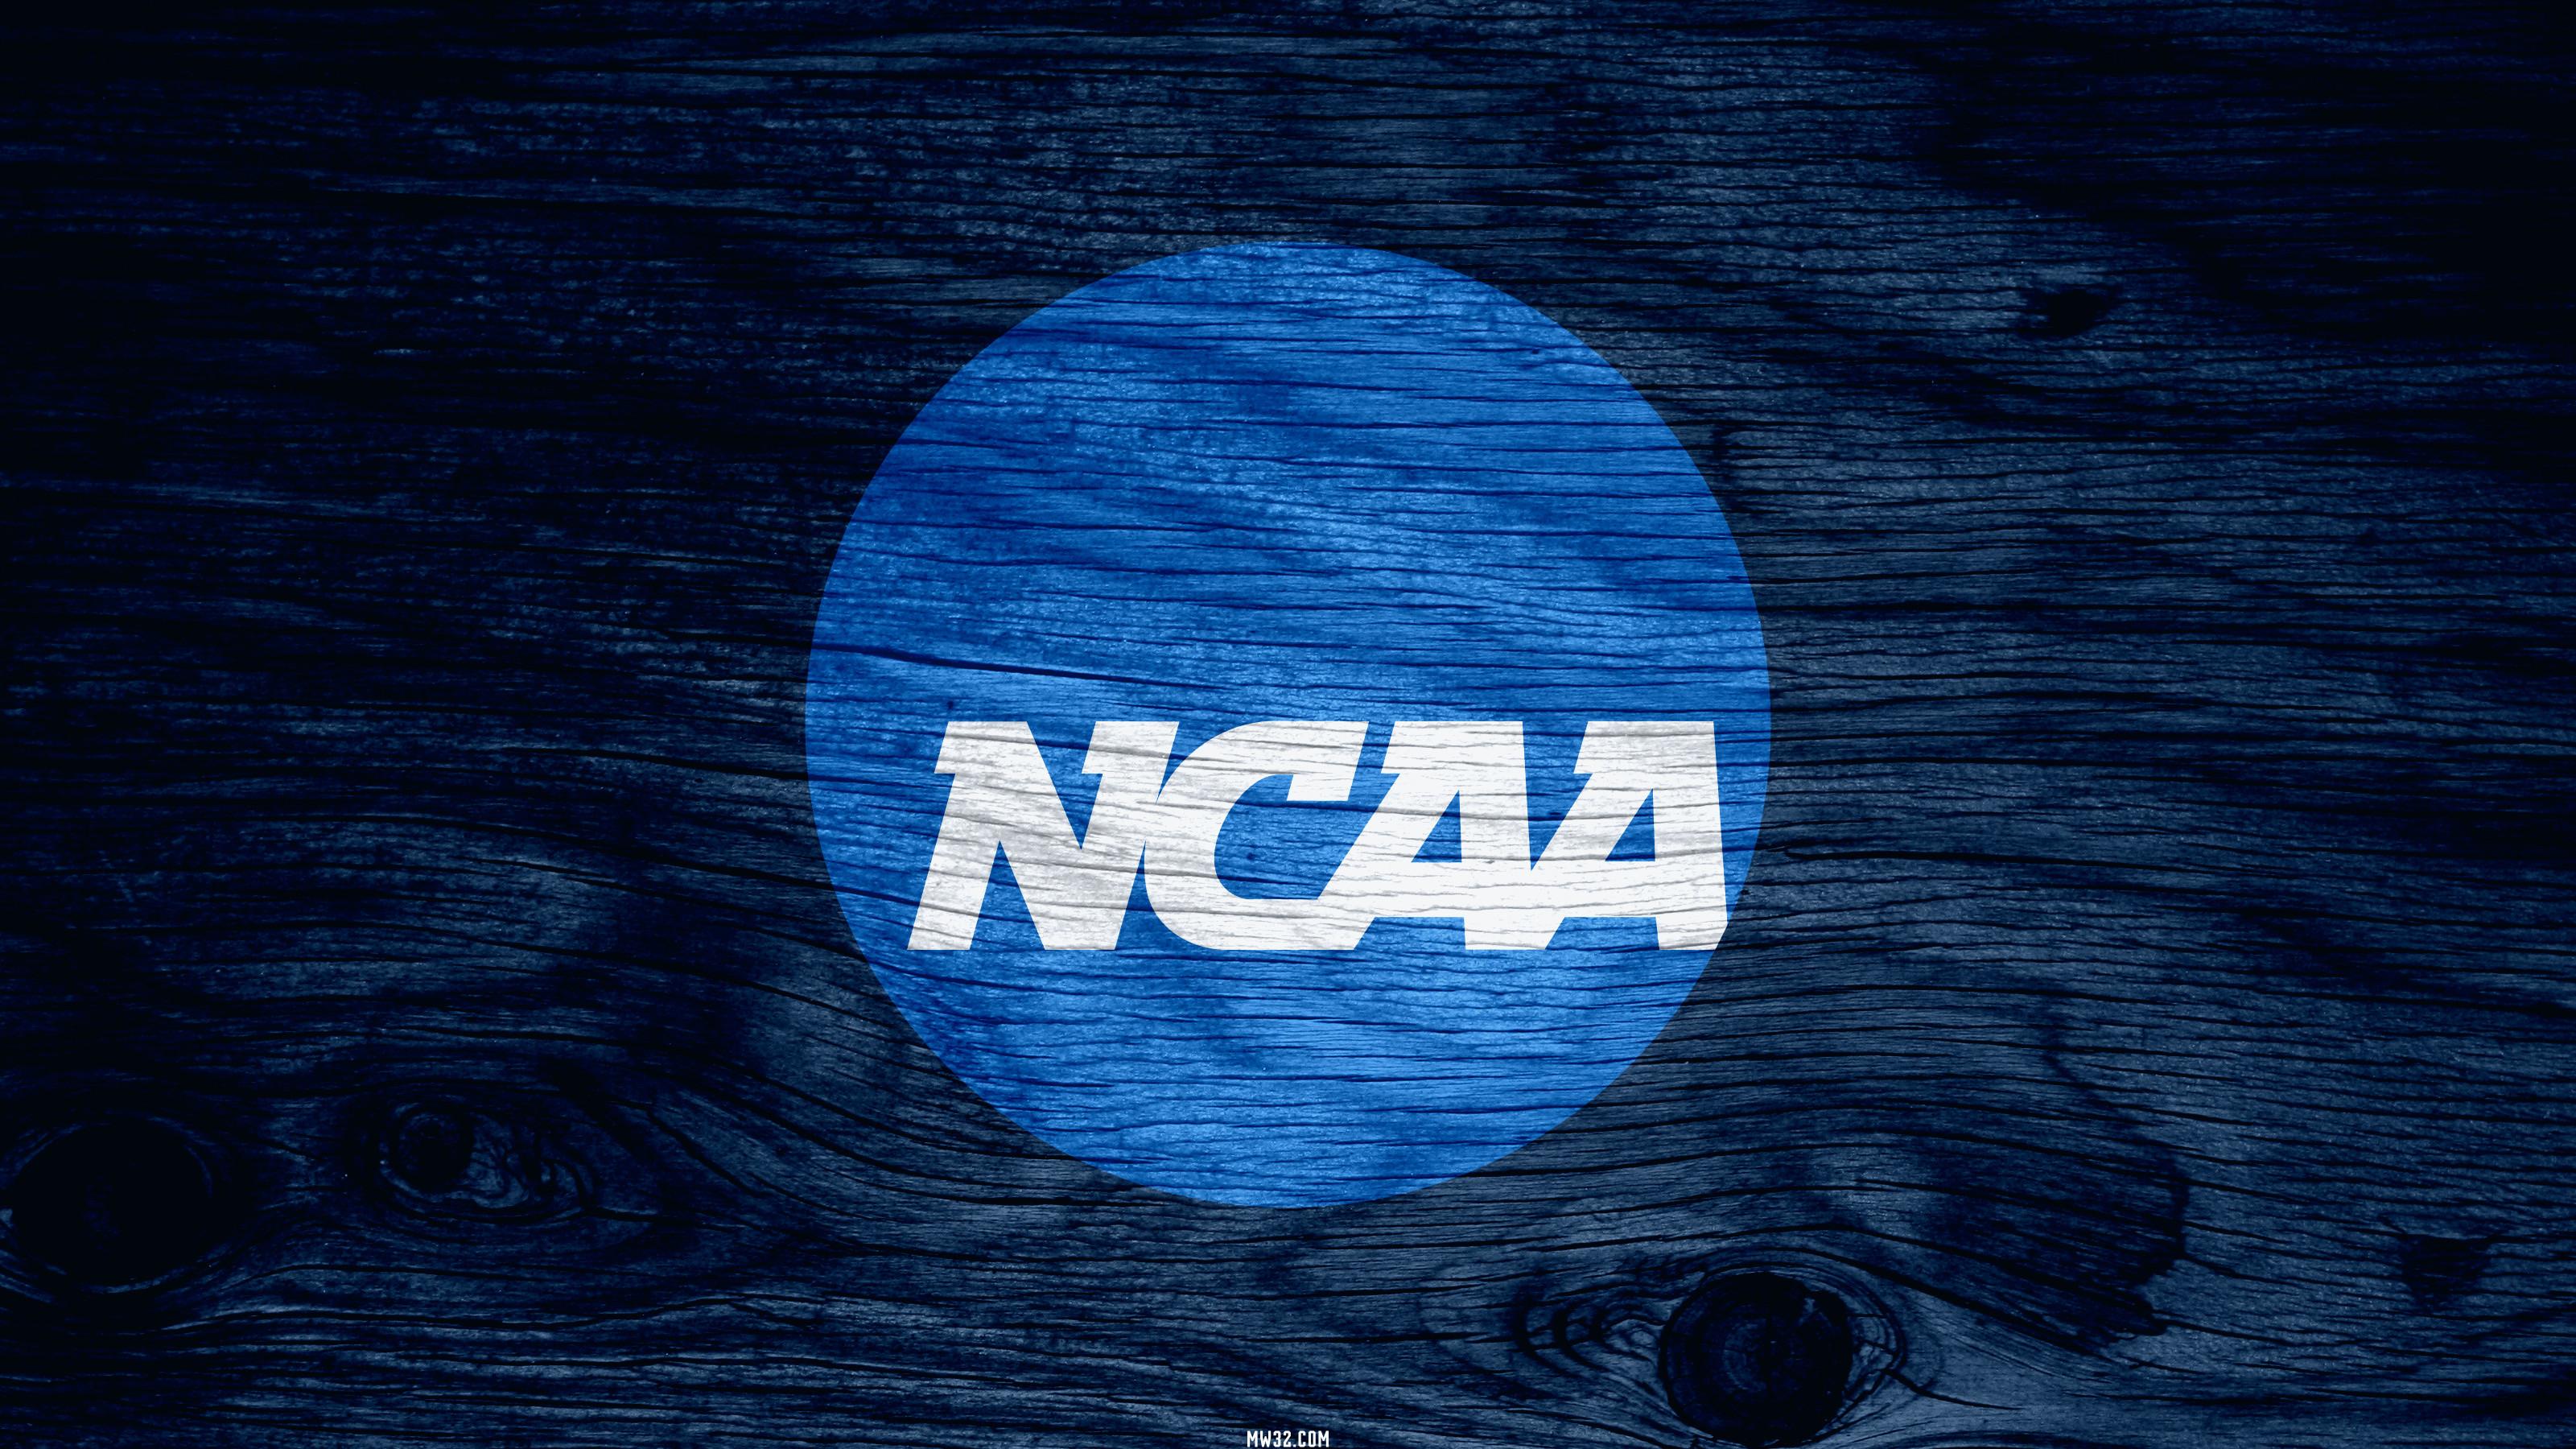 2013 NCAA FBS Weathered Wood Wallpapers 3201x1800